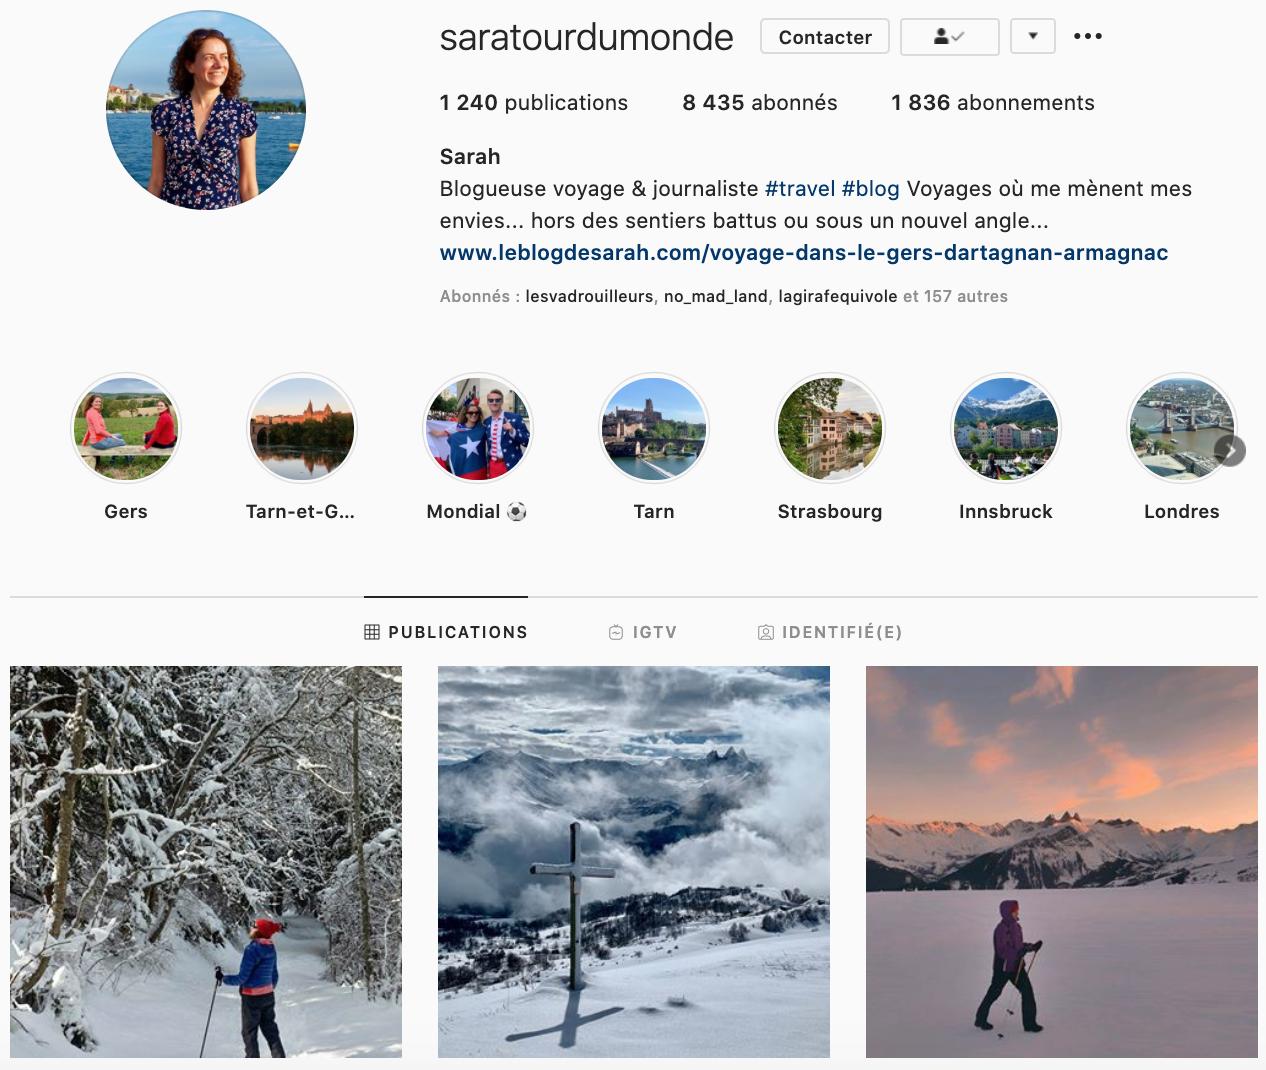 Saratourdumonde Instagrammers voyage à suivre